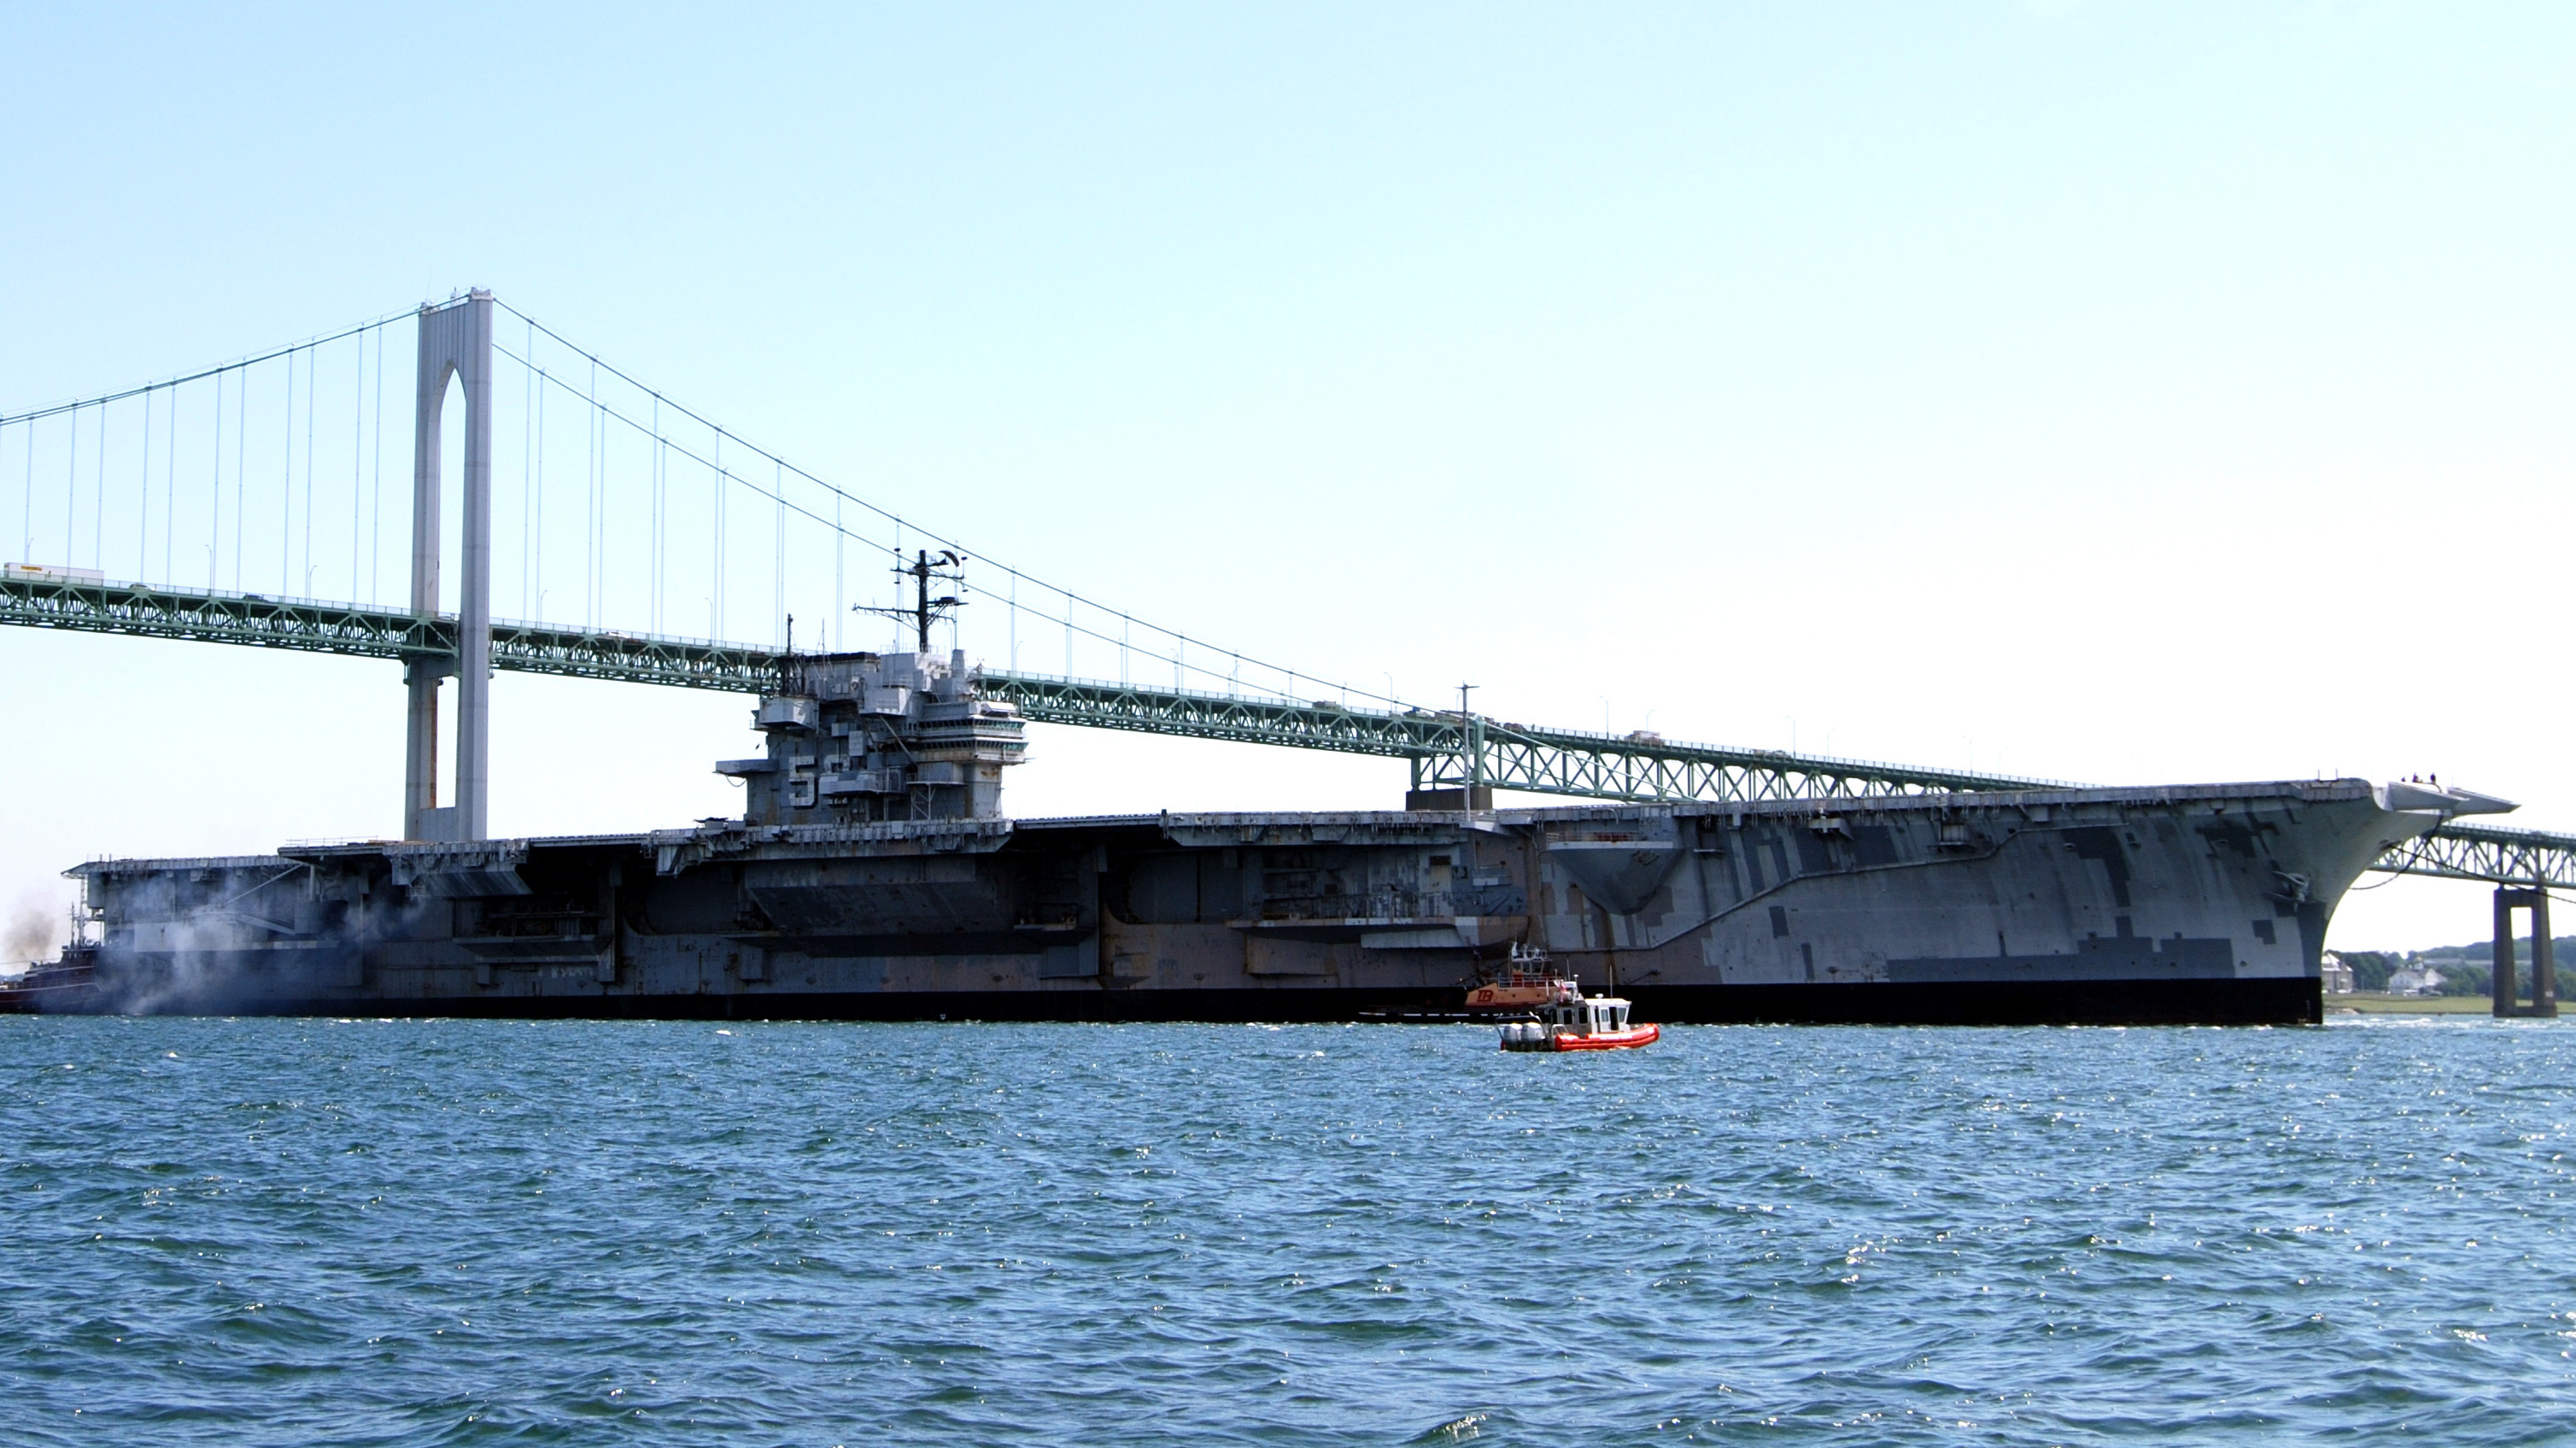 Ex-Navy Carrier USS Forrestal Sold For 1 Cent